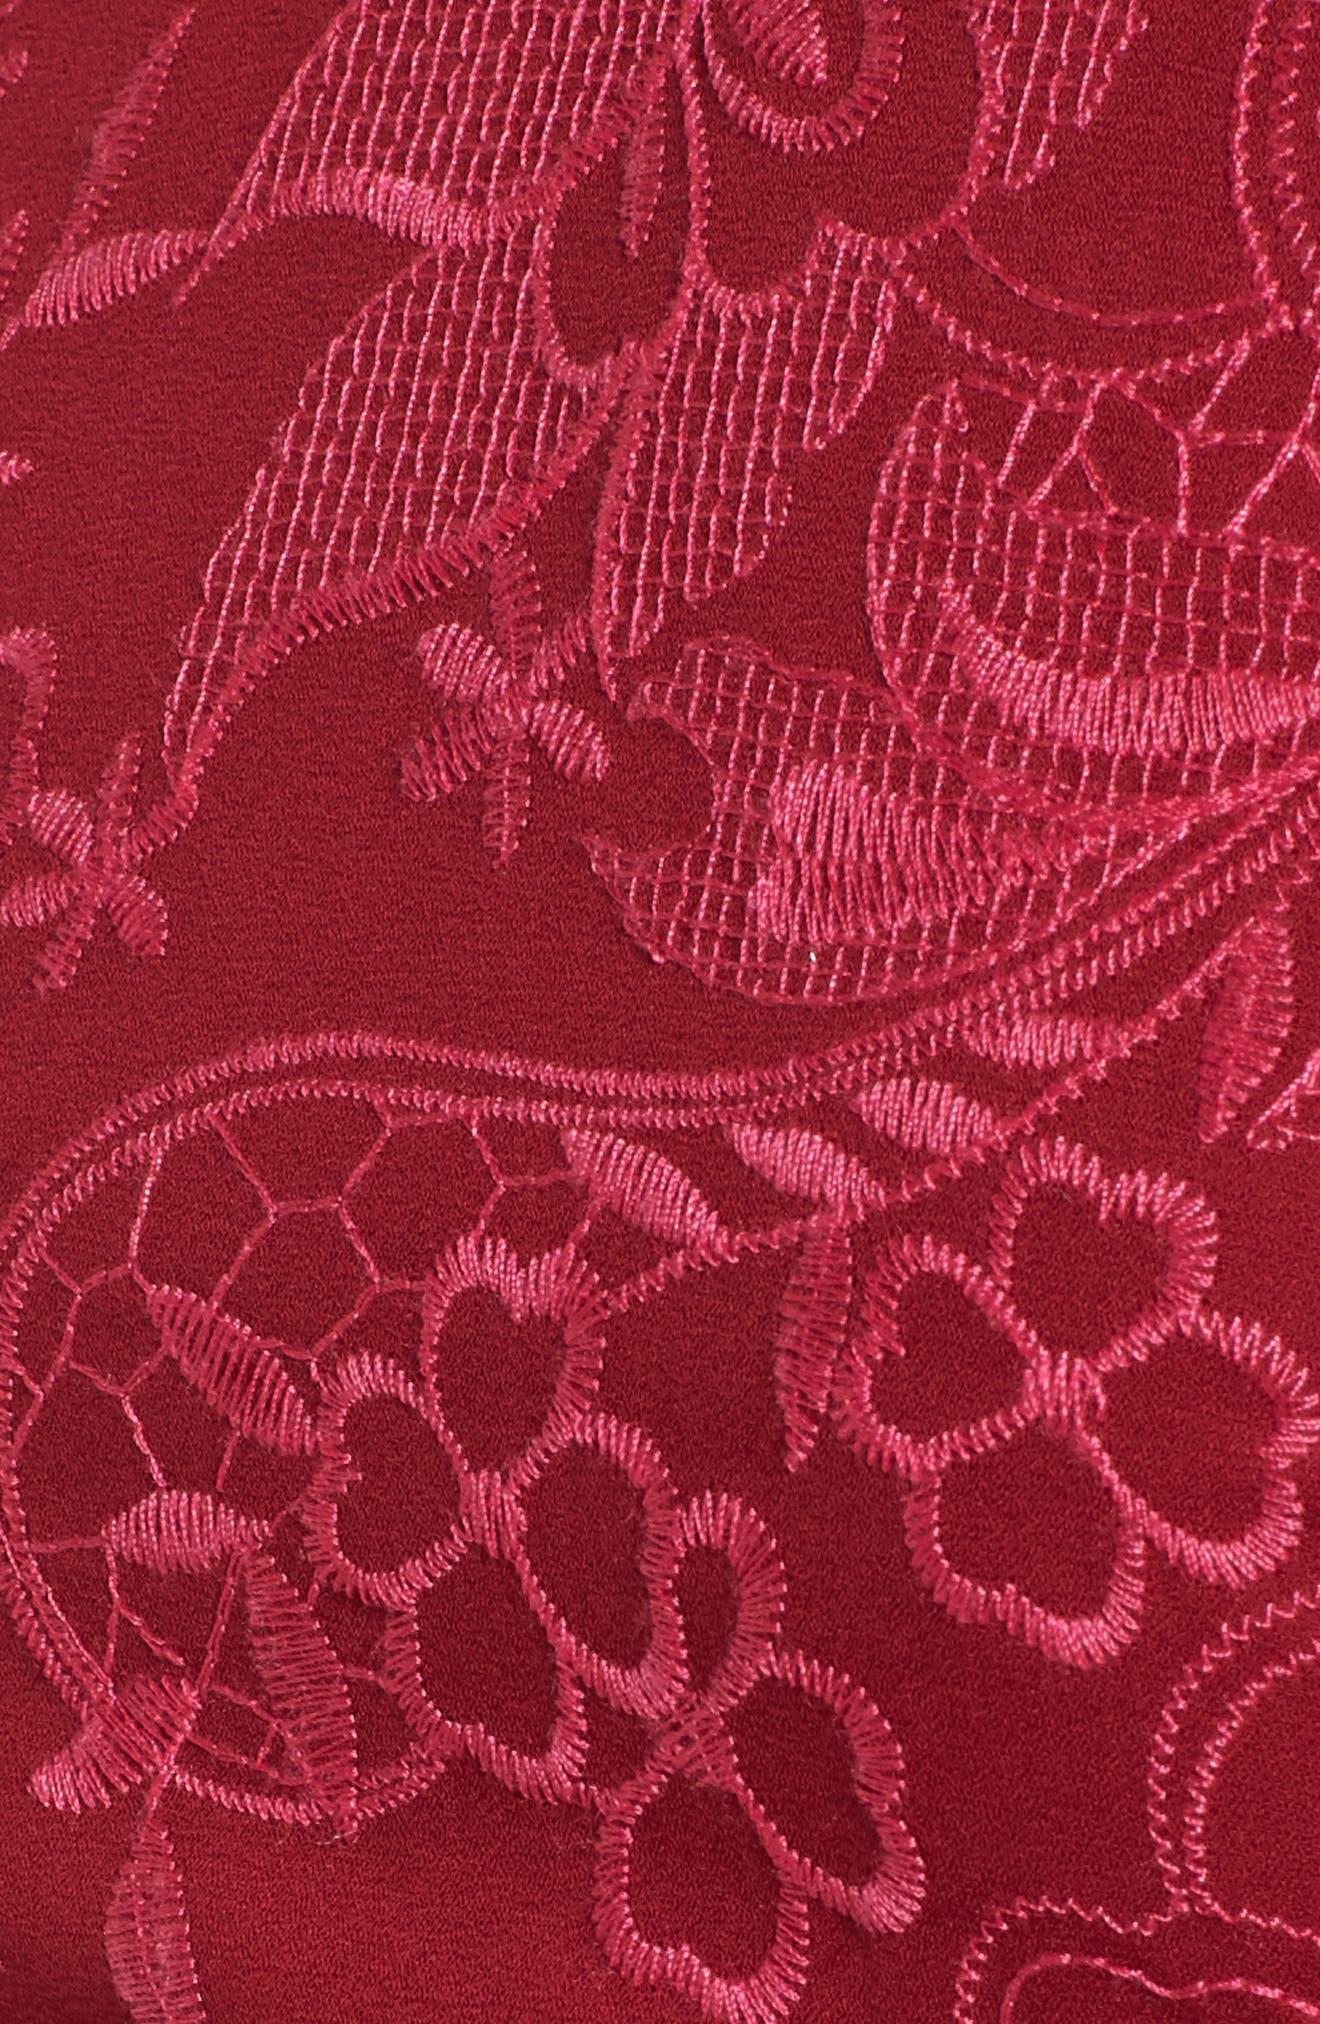 Serafina Bell Sleeve Dress,                             Alternate thumbnail 5, color,                             Shiraz